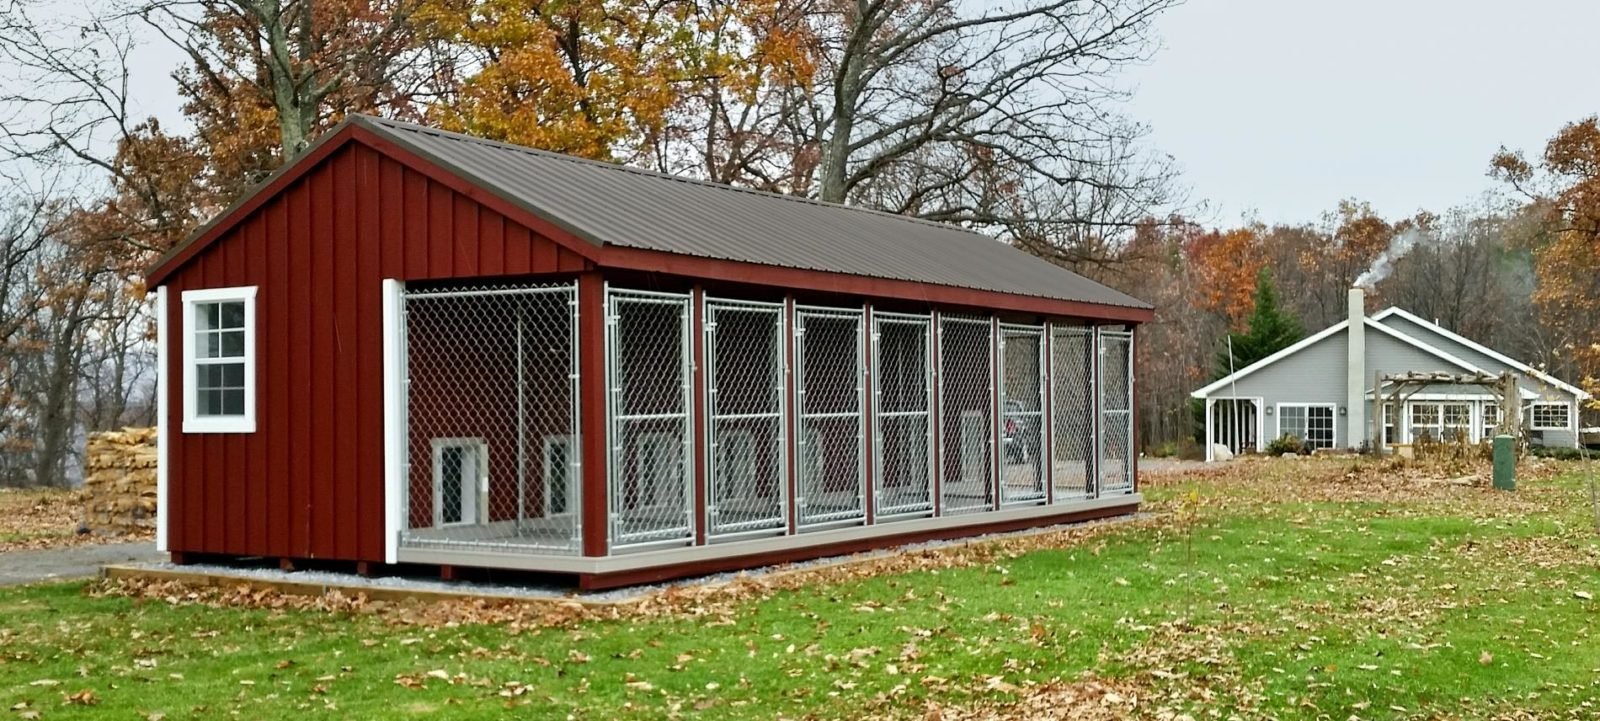 Insulated Dog Kennel Interior Dog Kennel Design Photos